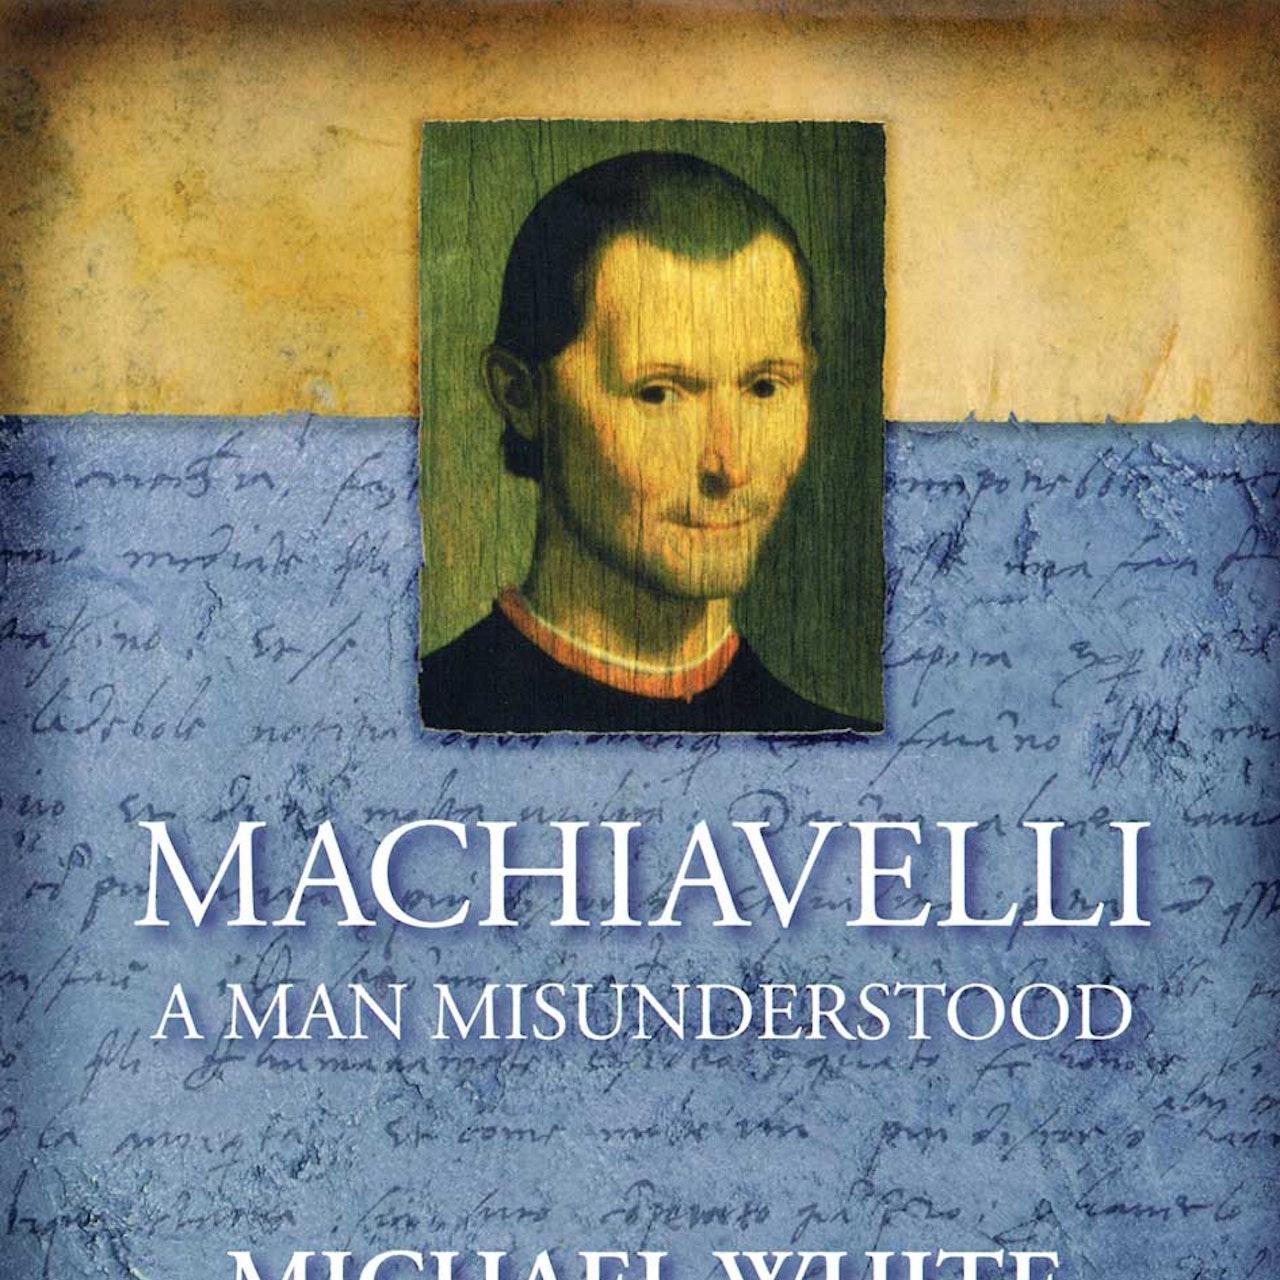 Machiavelli_kimmcgillivray